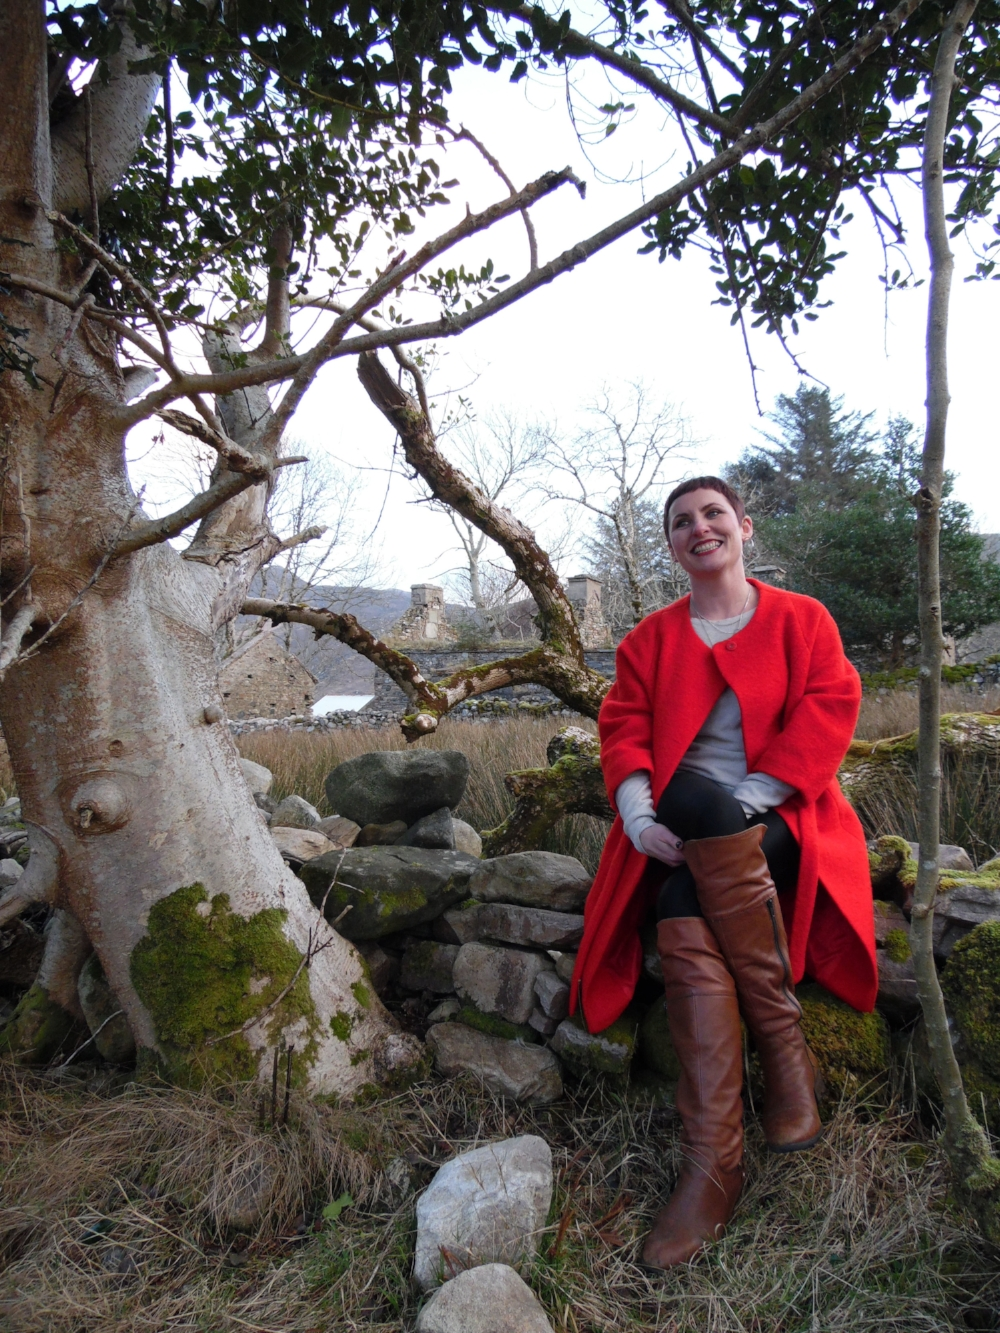 me - Moira Ní Ghallachóir - mng - Dunlewy, Donegal